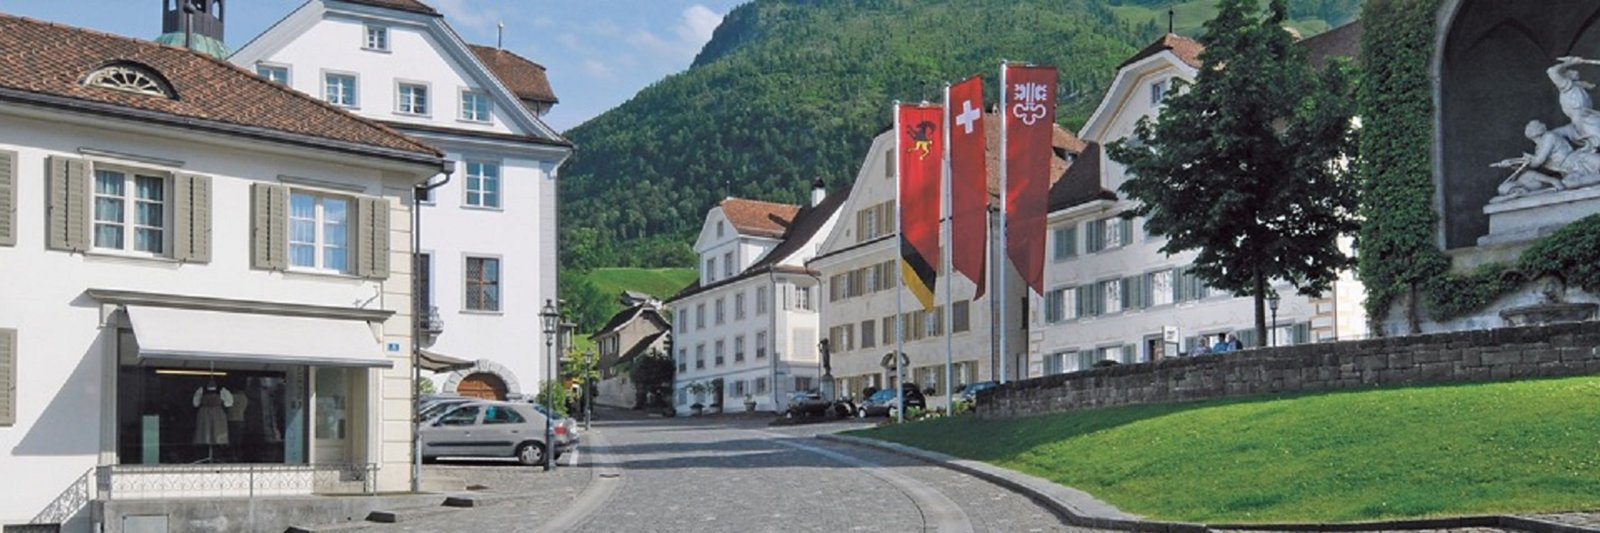 Raiffeisenbank Nidwalden